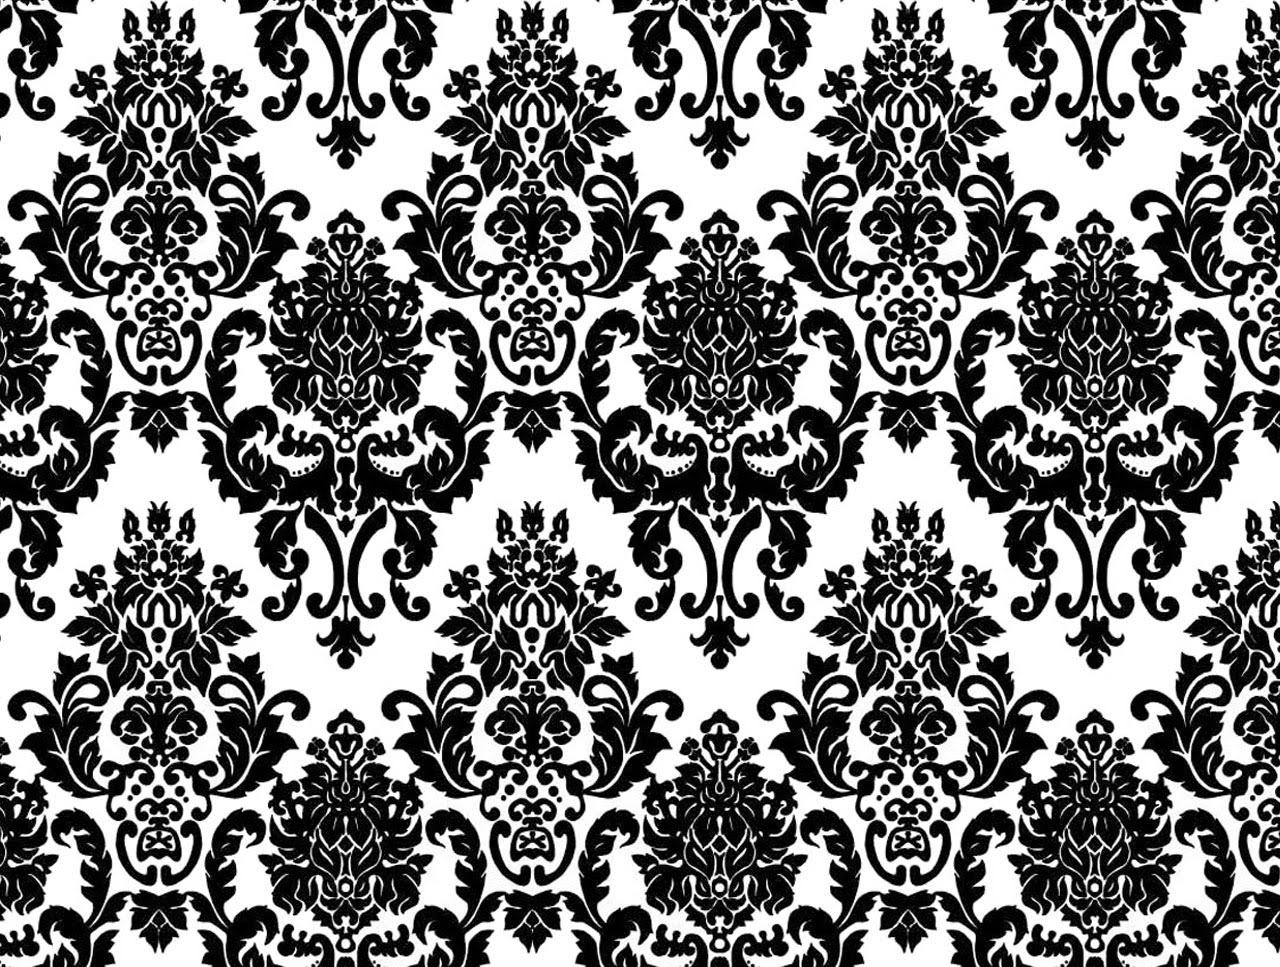 Mix Damask Wallpaper ~ WallpaperYork | Brows your ...